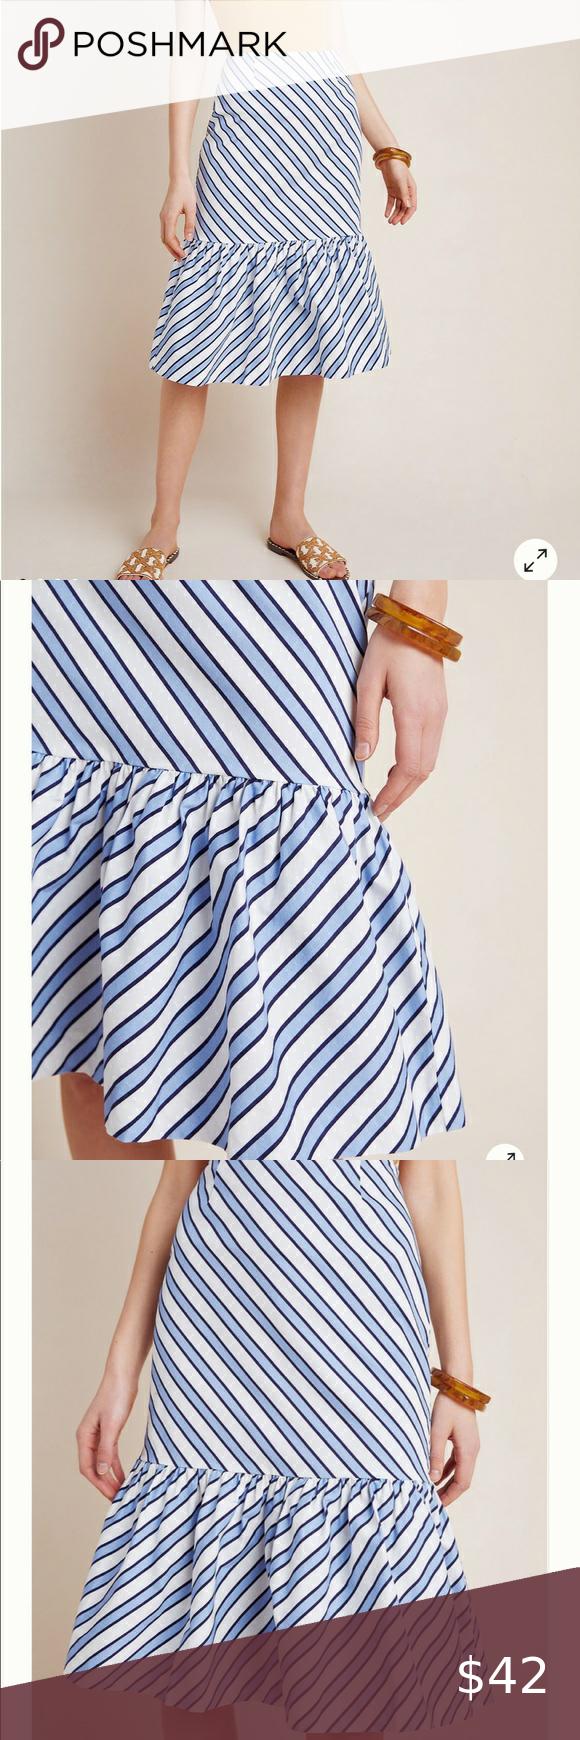 NEW Anthropologie Maeve Ryanne Flounced Midi Skirt